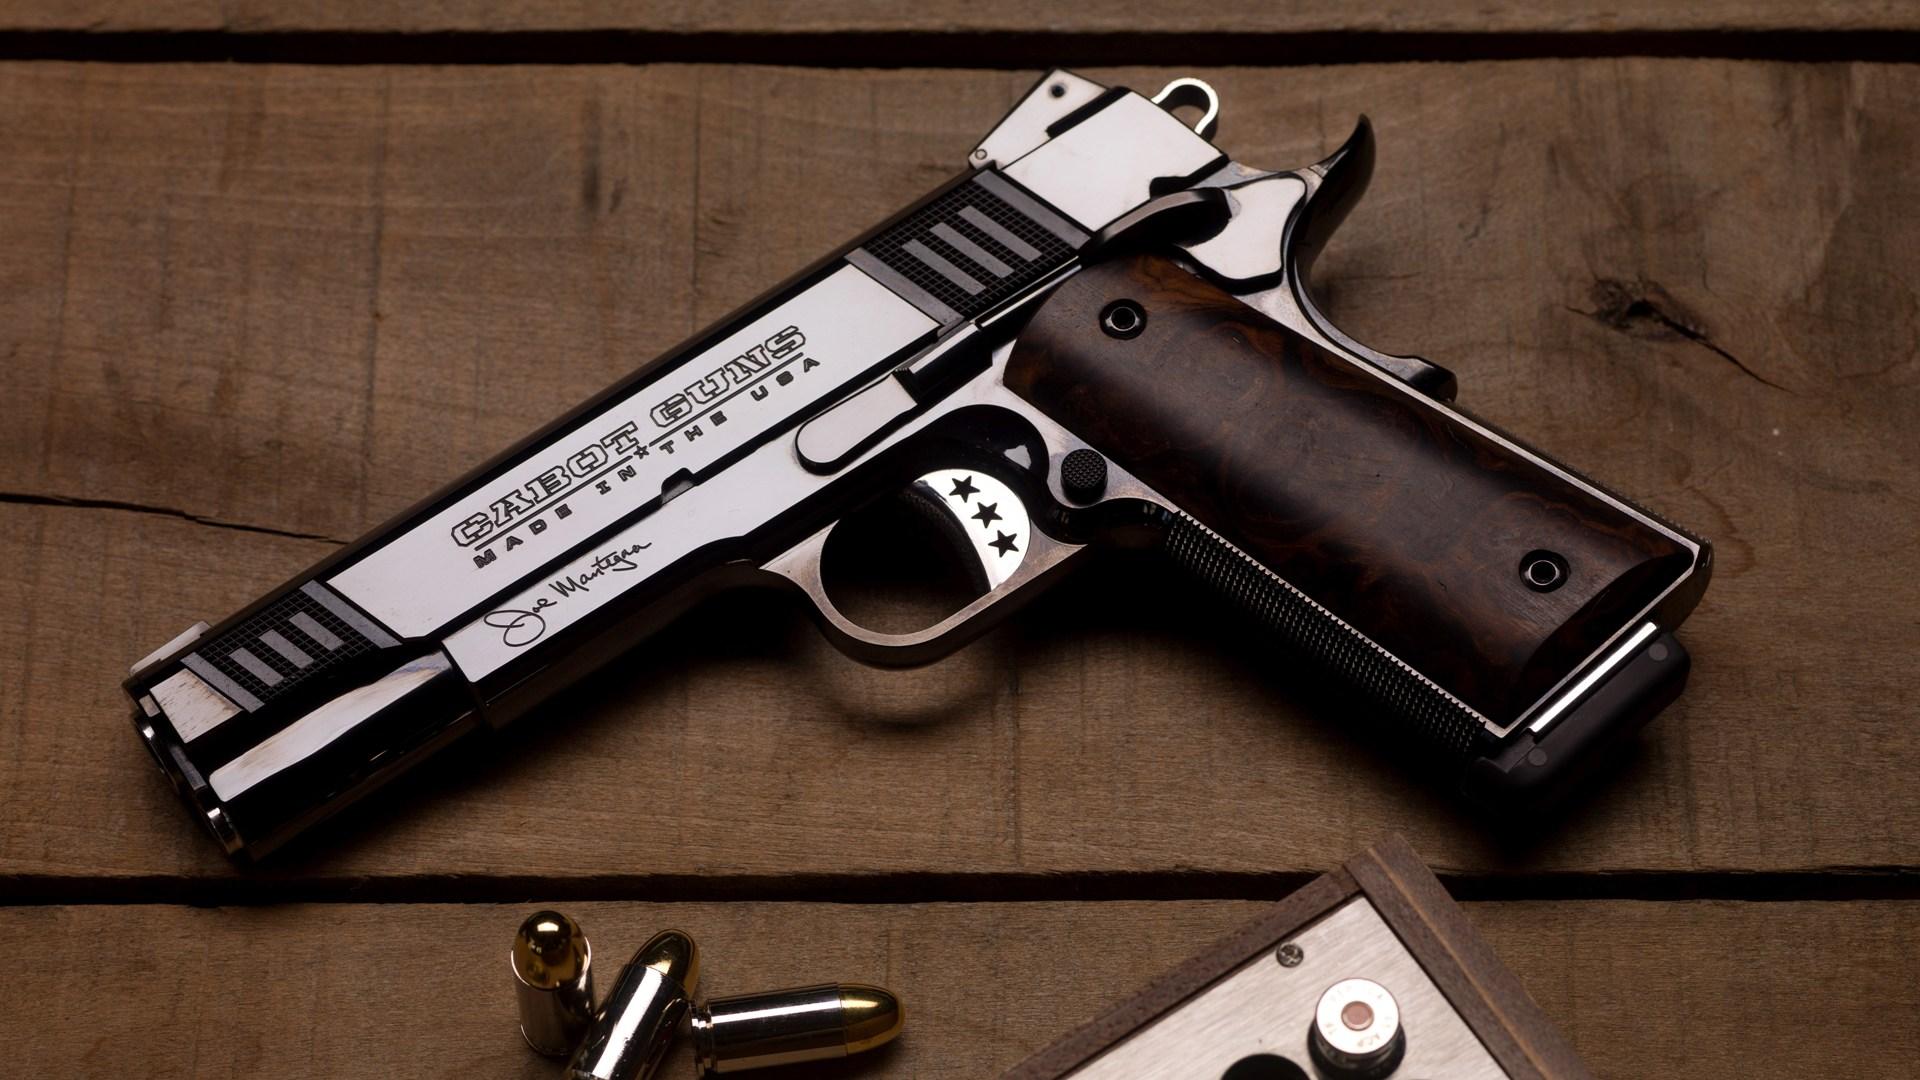 60+ The Attractive Gun Wallpaper Designs